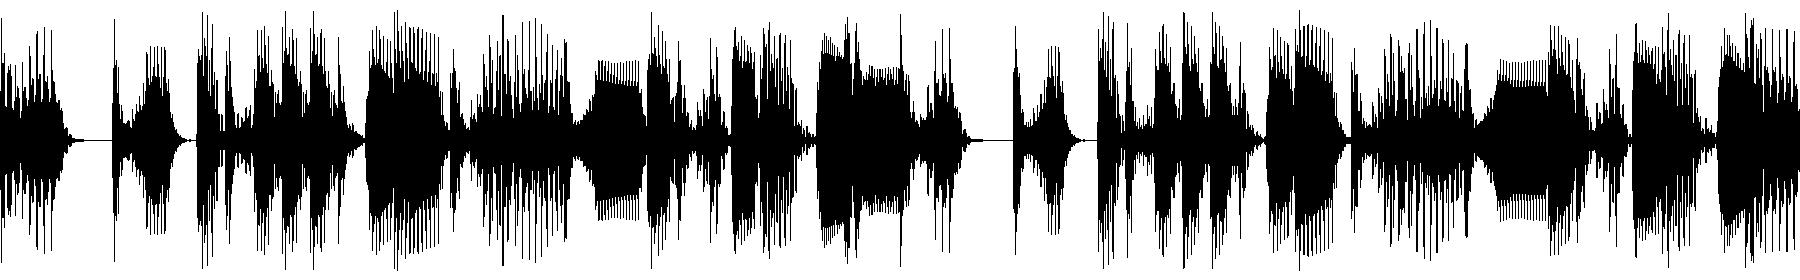 bass role